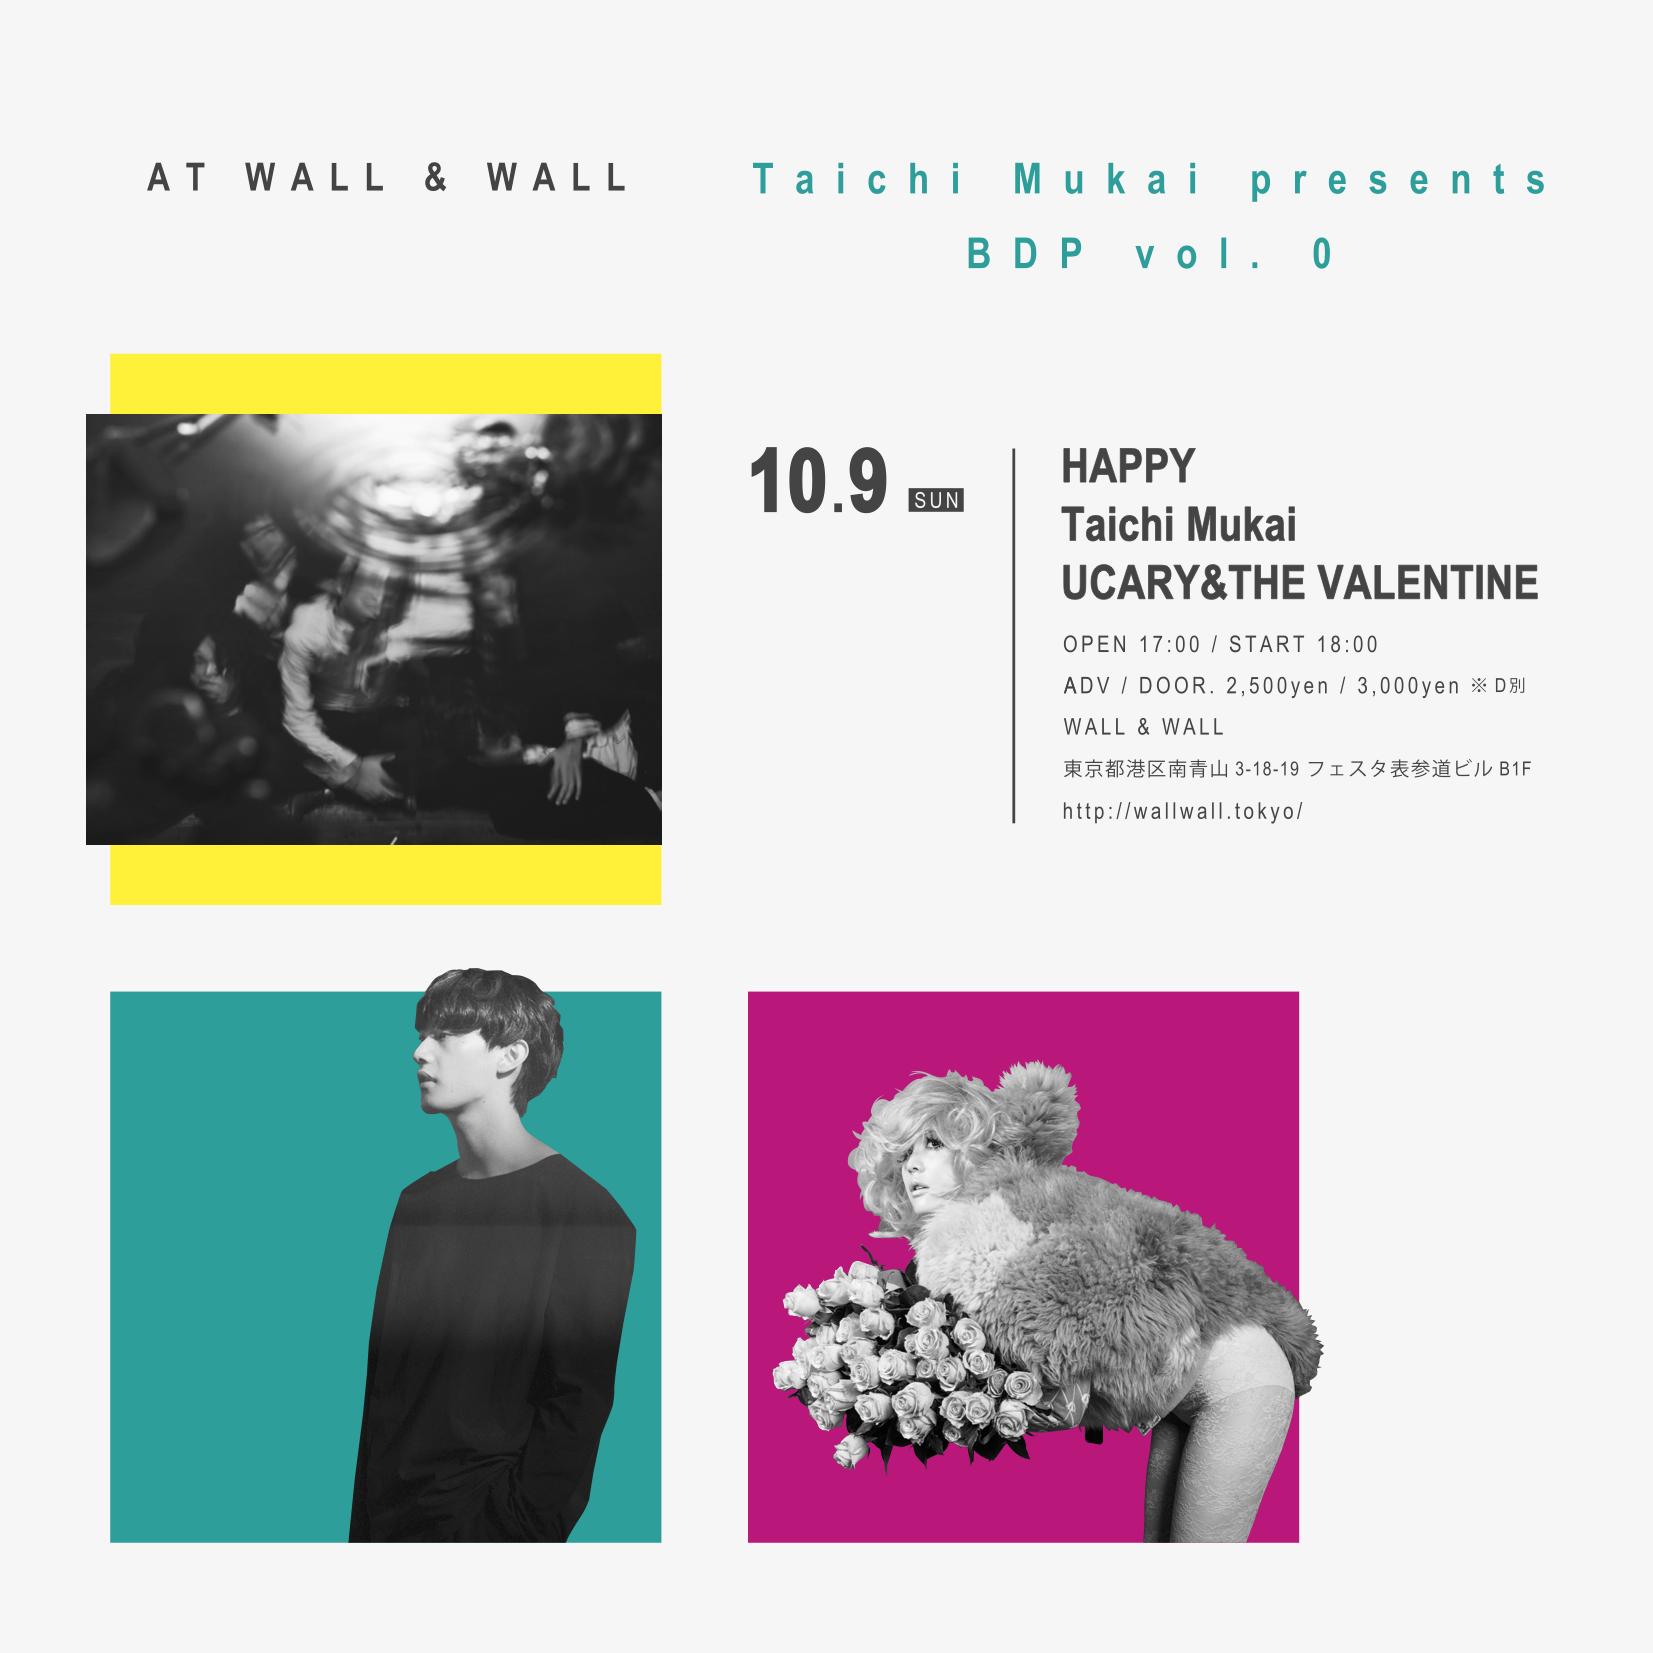 wallwall-%e3%82%b3%e3%83%92%e3%82%9a%e3%83%bc